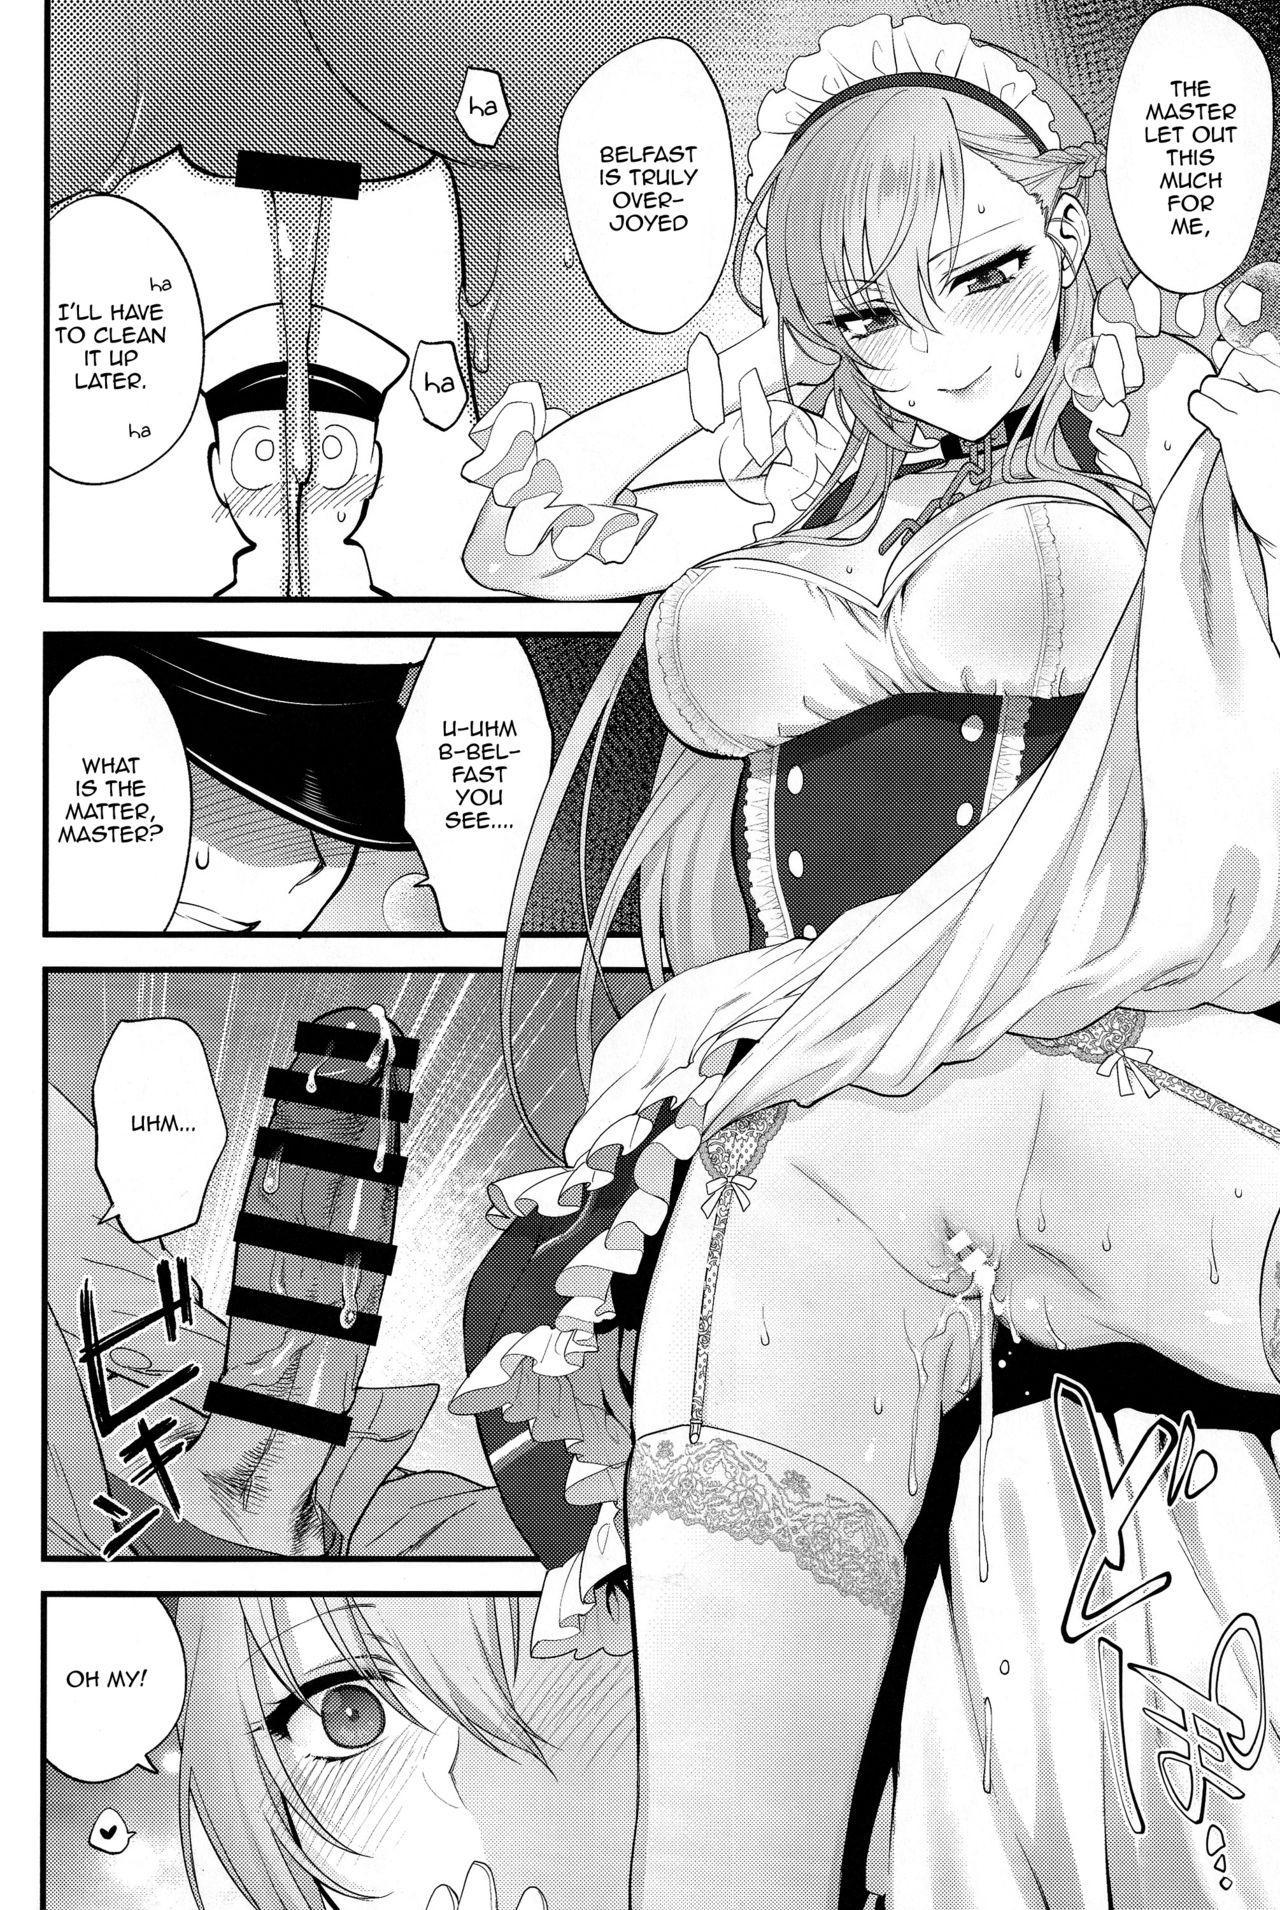 Maid no Tashinami - Discretion of the maid 10